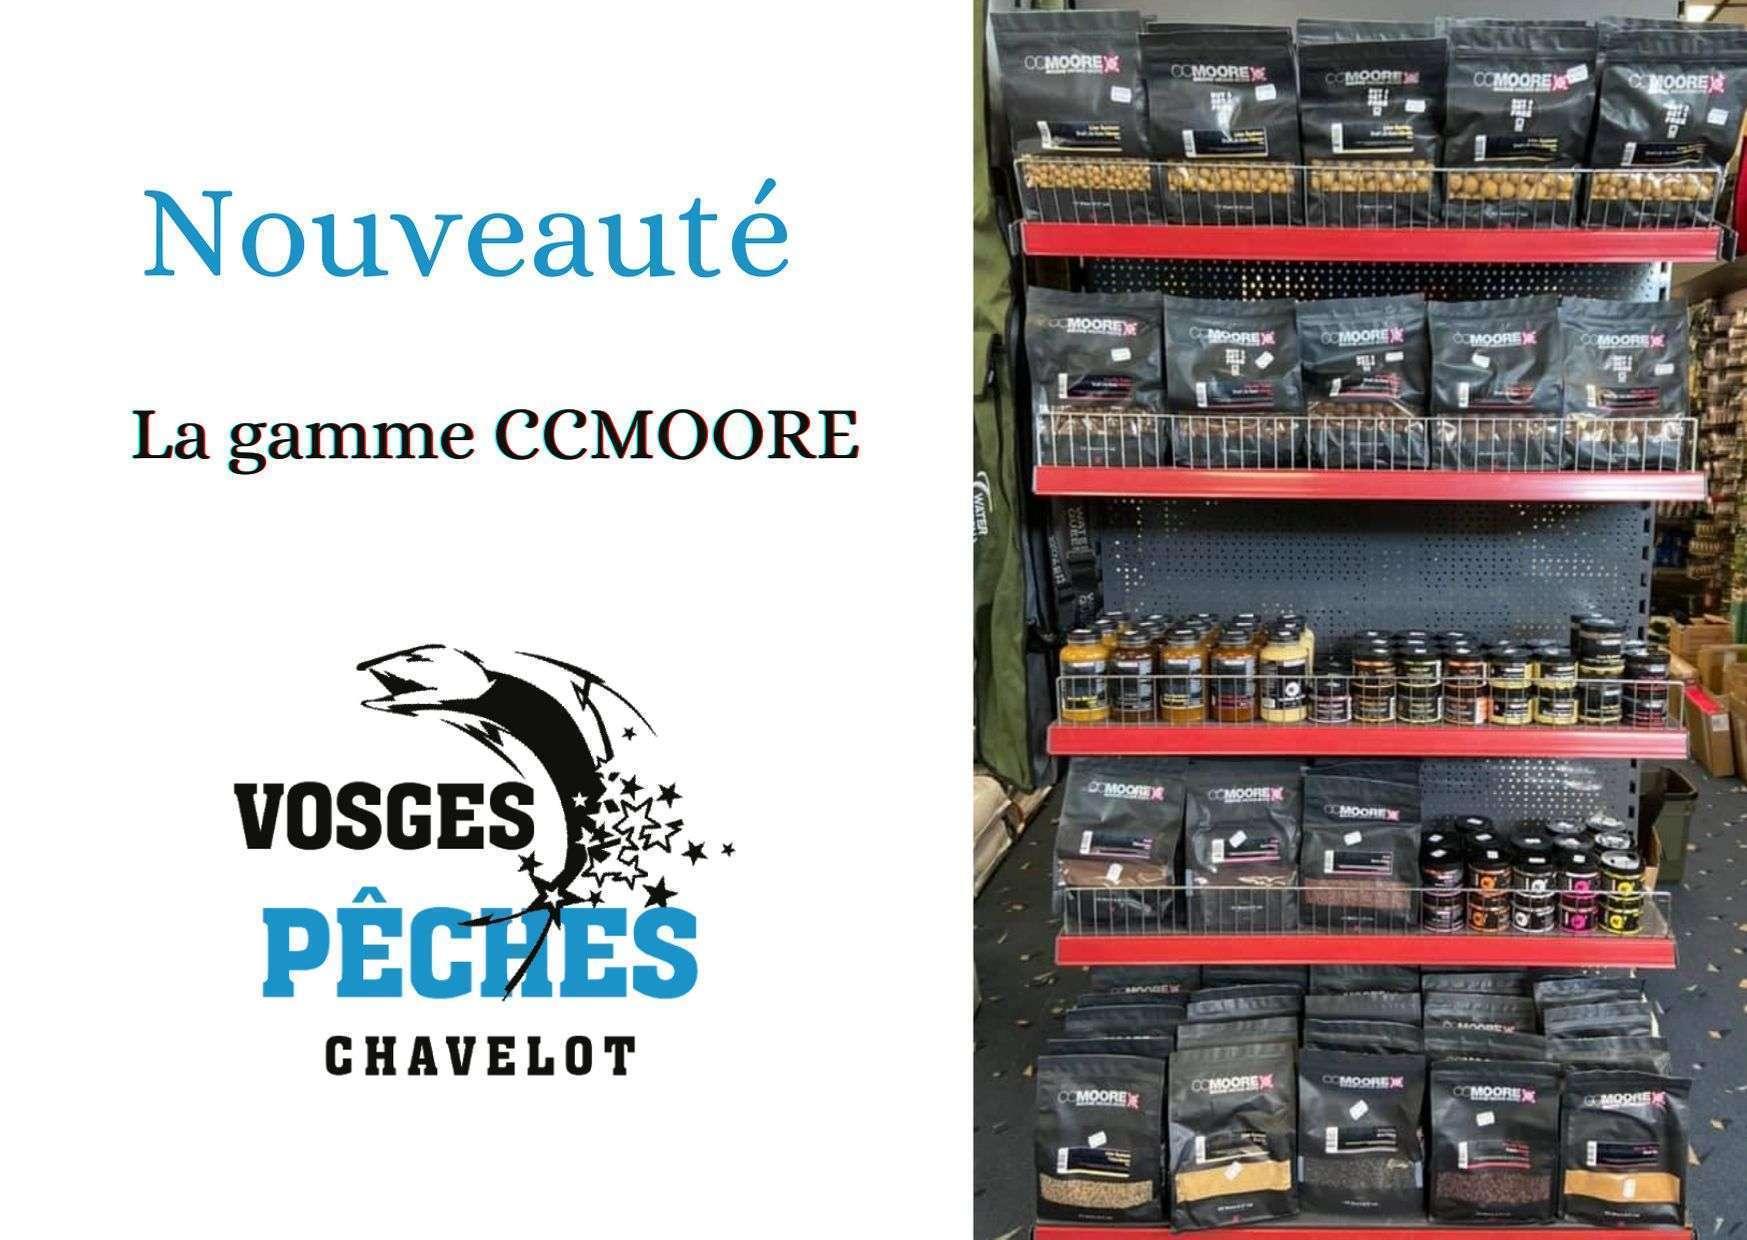 La gamme CCMOORE est maintenant disponible !